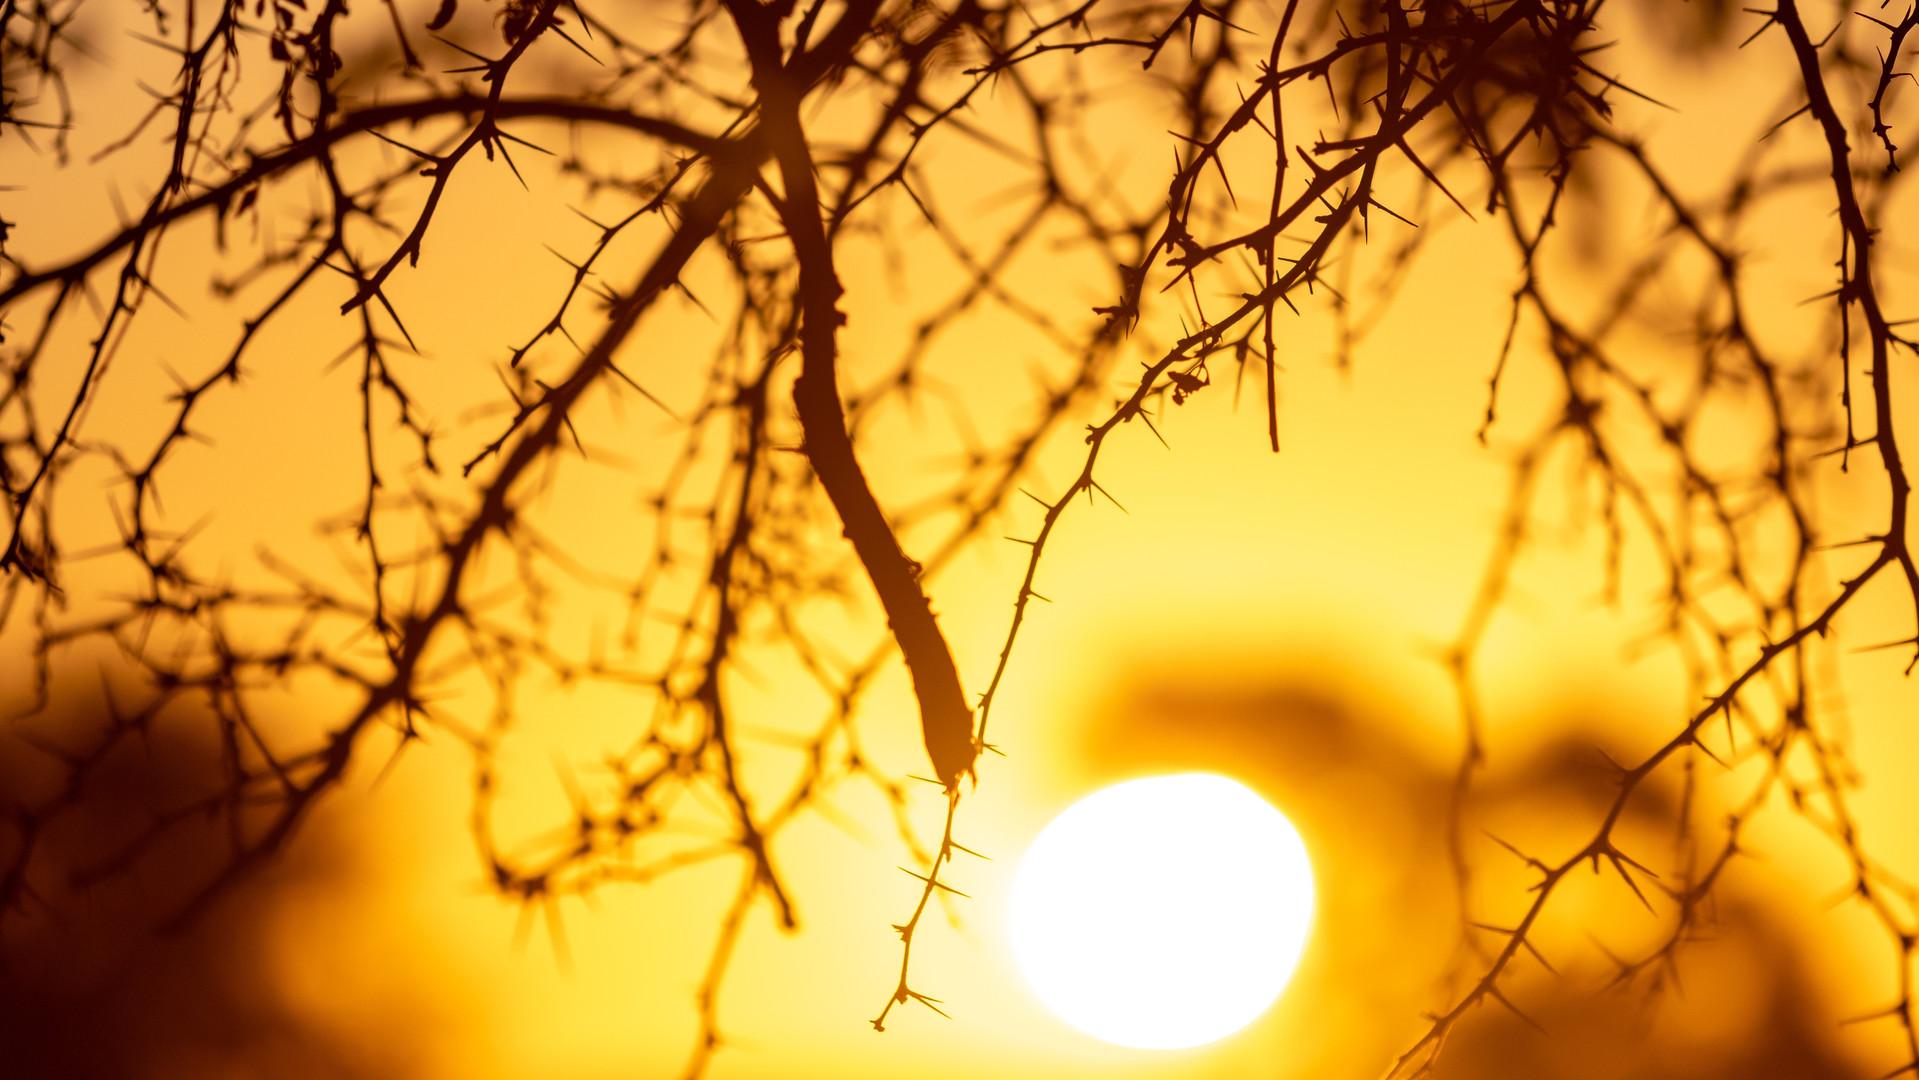 sunset-4993832.jpg